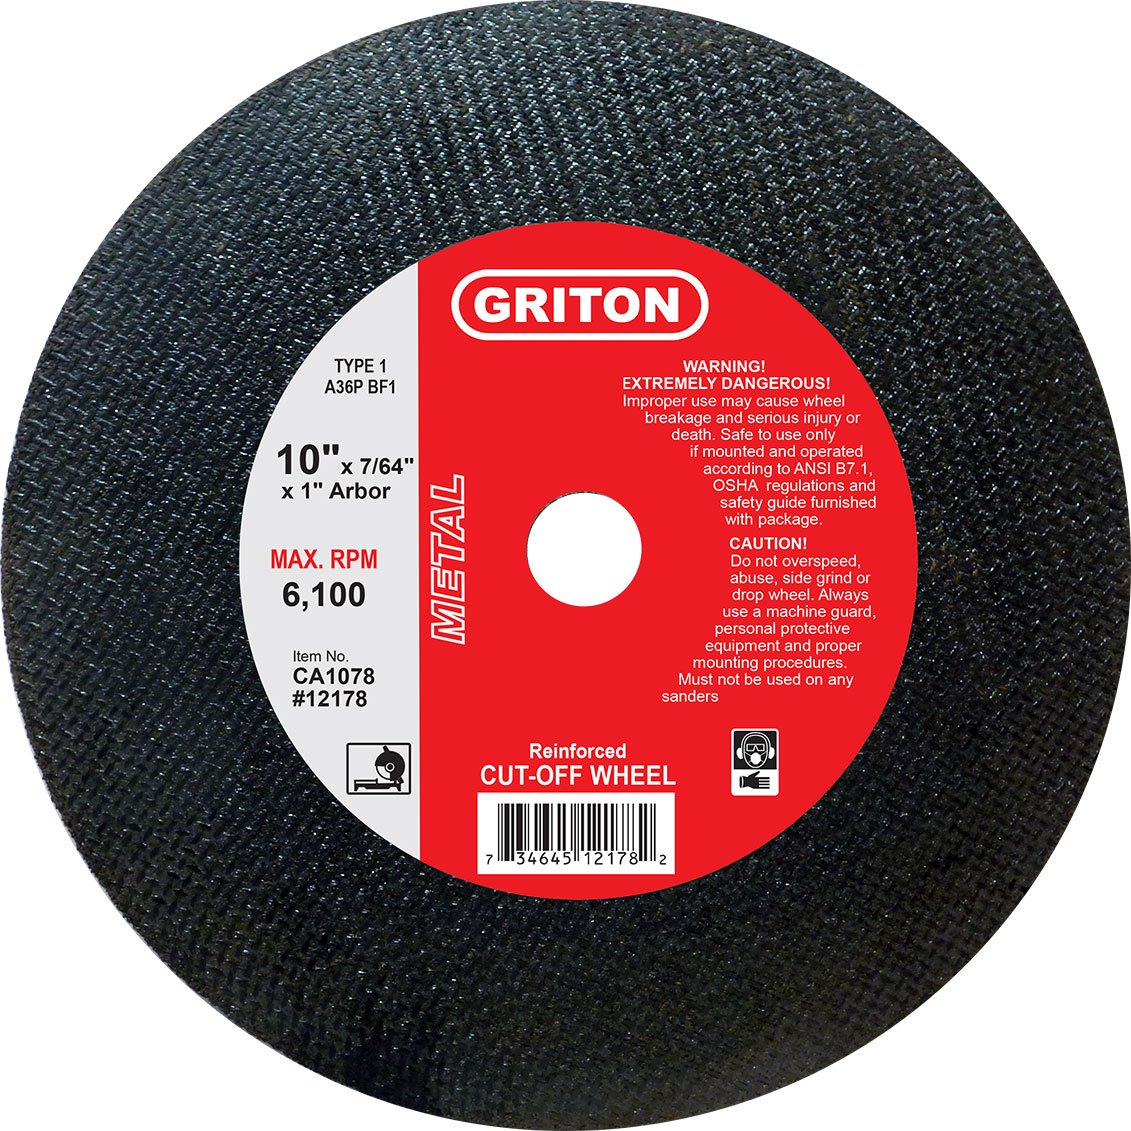 Griton CA1078 Arbor Industrial Cut Off Wheel for Metal Used on Low Horse Power Chop Saws, 1.0'' Hole Diameter, 10'' Diameter, 7/64'' Width (Pack of 10)